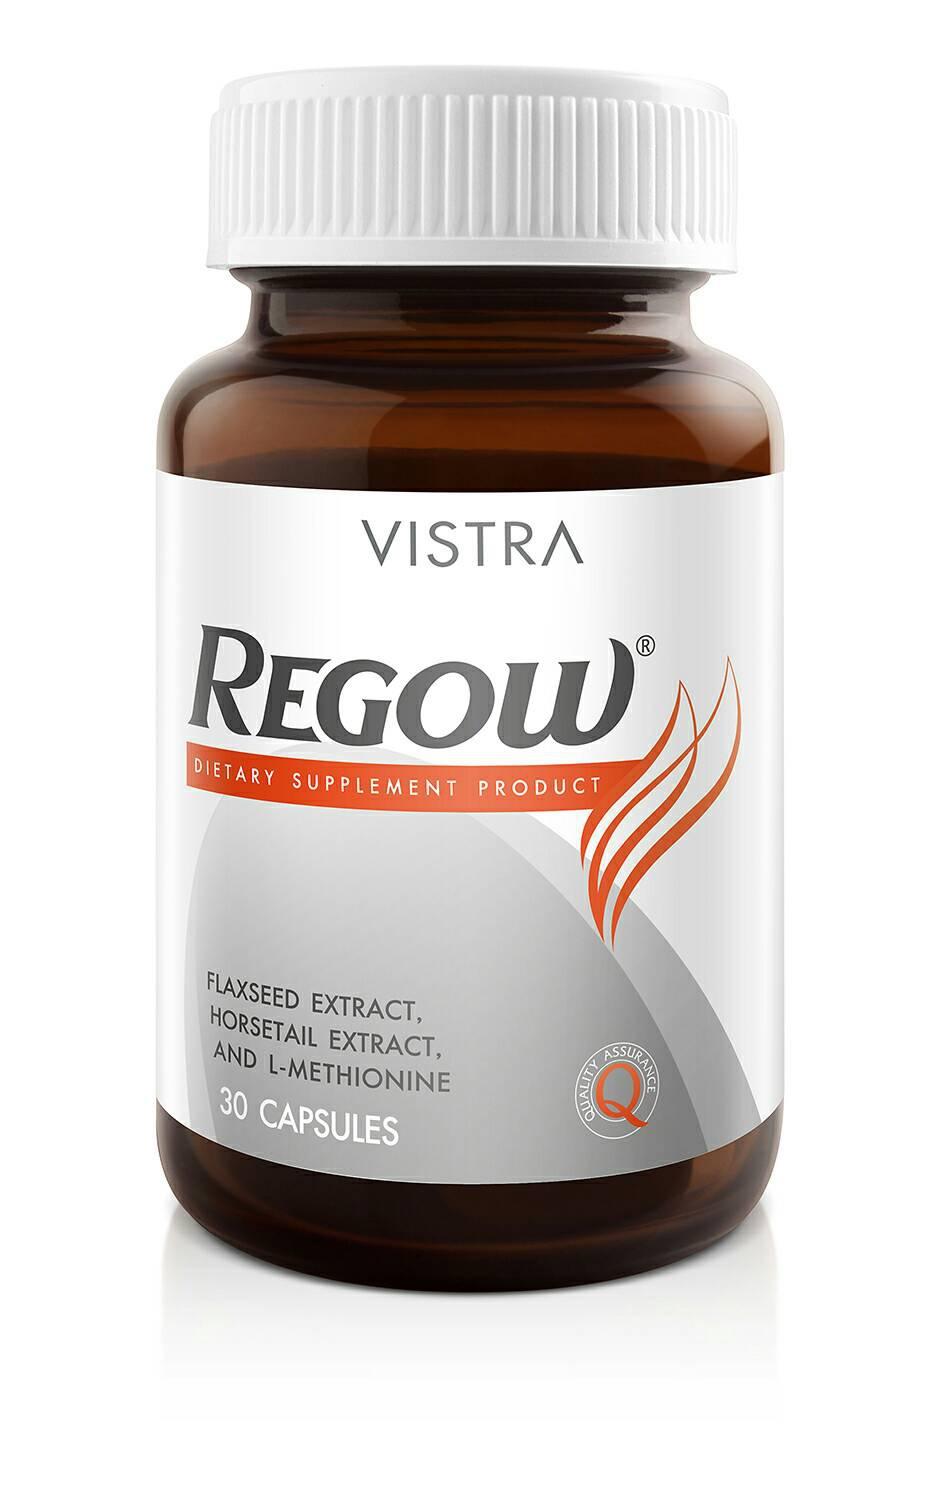 Vistra Regow วิสตร้า รีโกว์ 30 Capsules เพื่อสุขภาพผม ผิว เล็บ ที่แข็งแรง